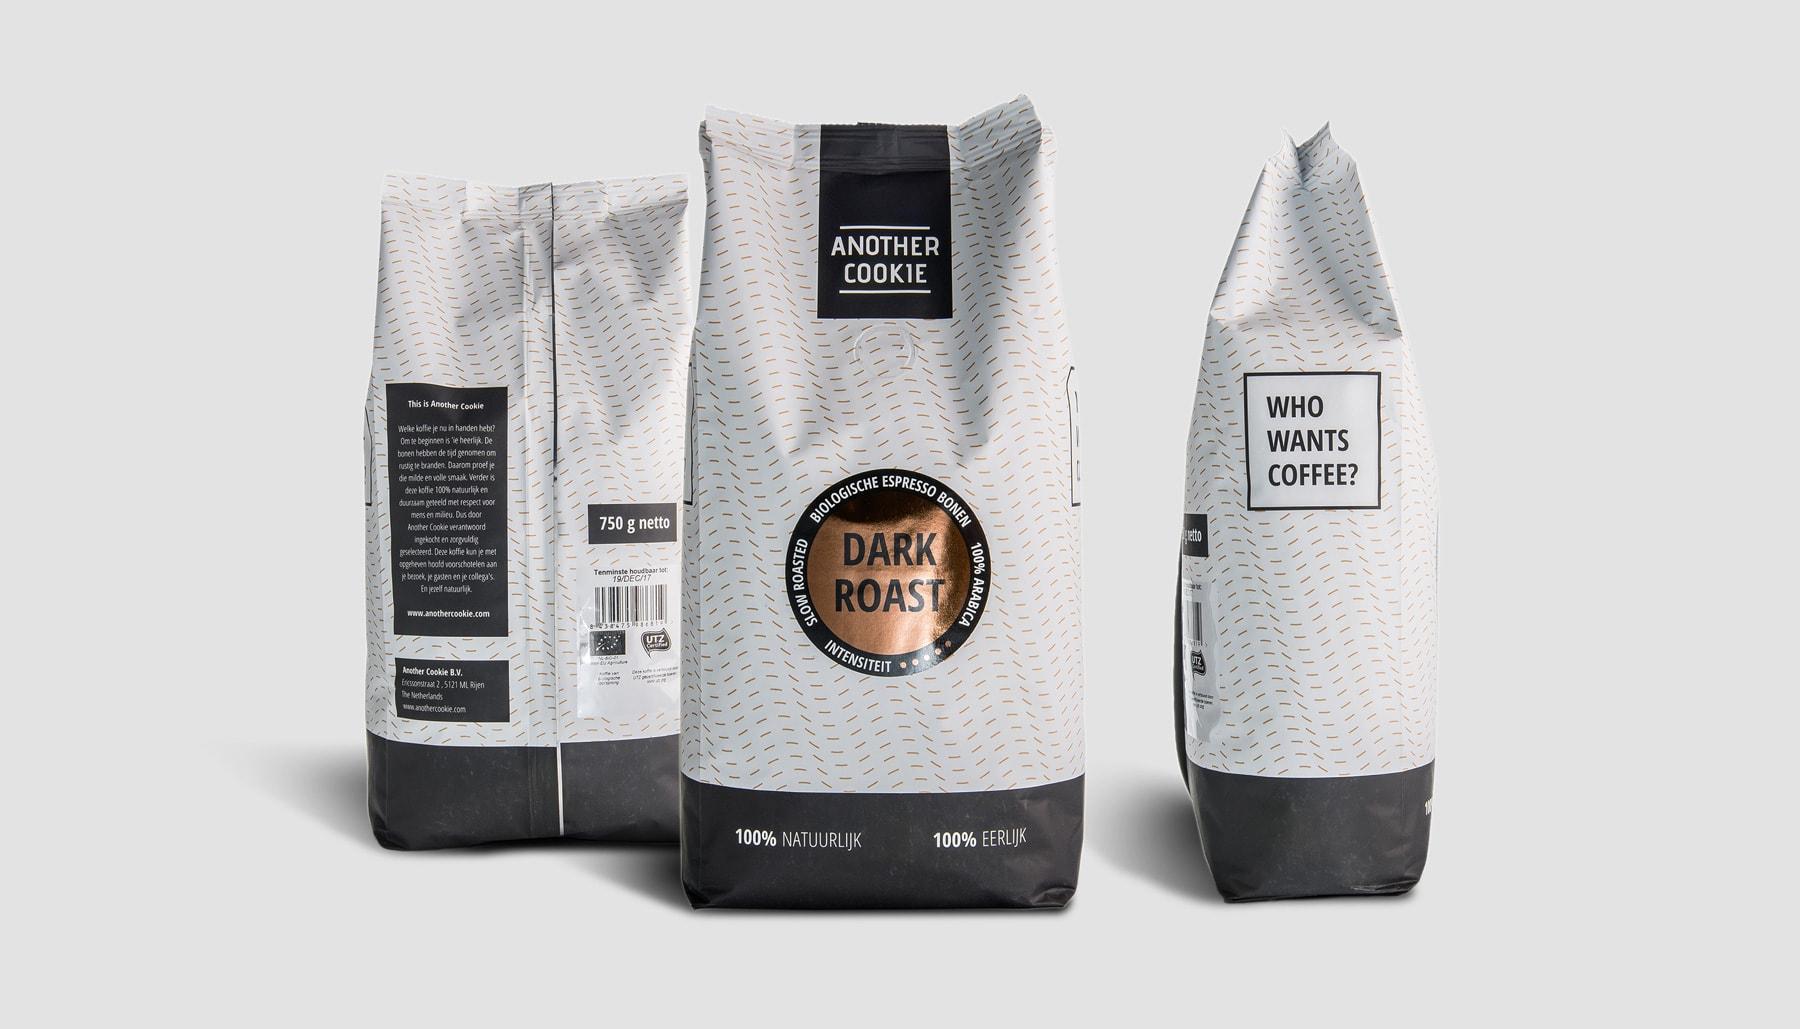 Another Cookie / Dutchy Design / Branding & Design Portfolio